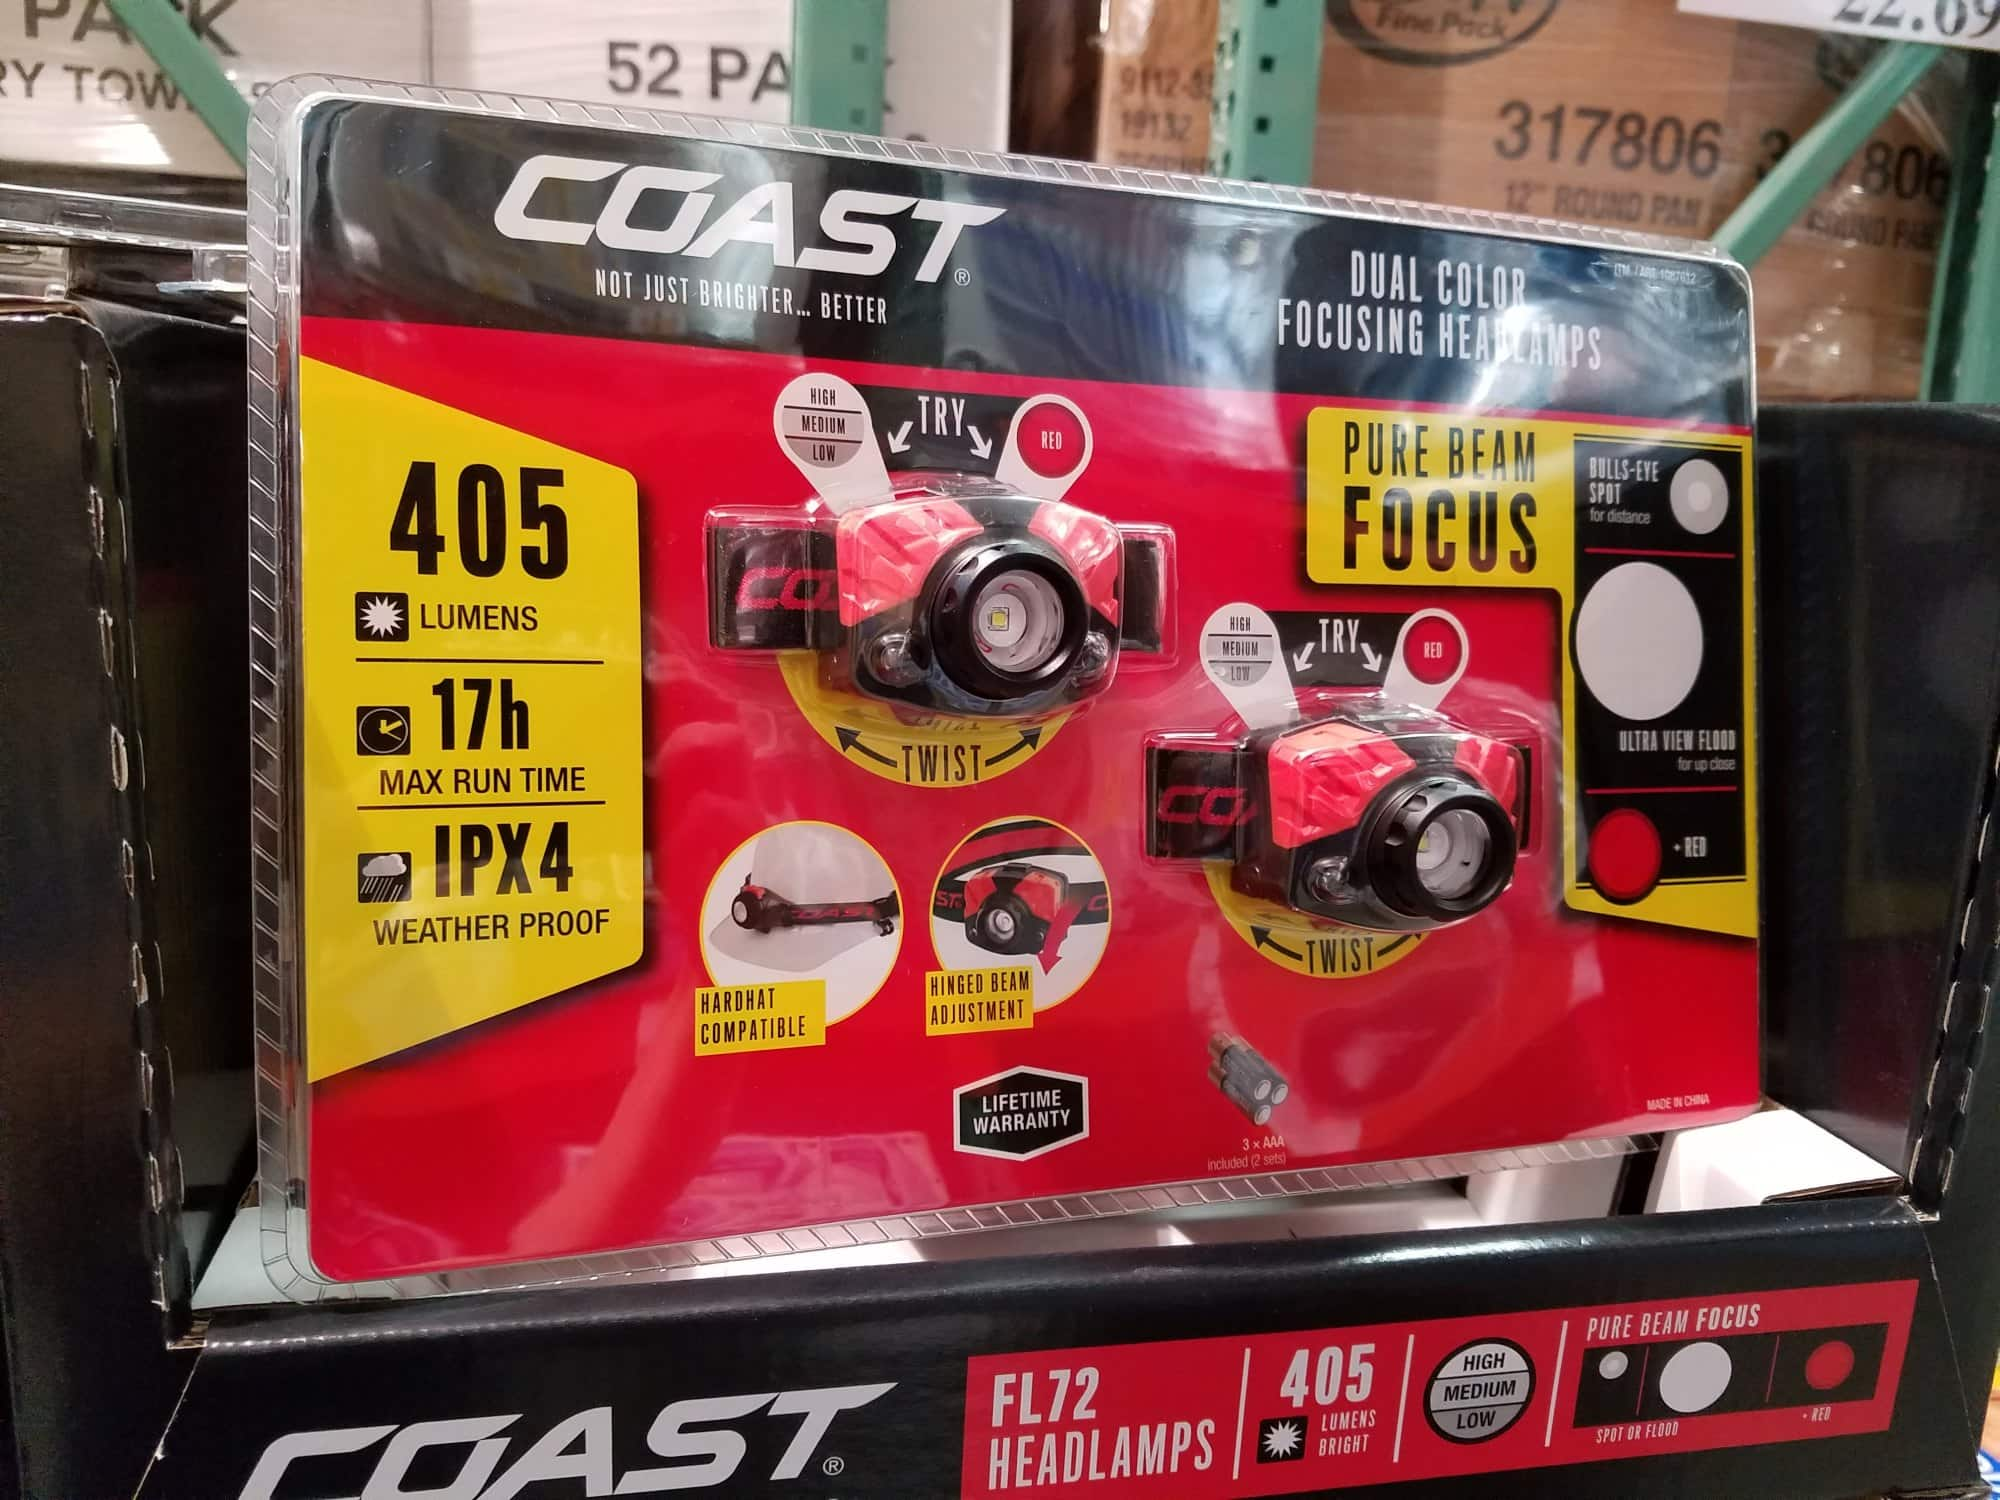 Costco B&M - Coast Headlamp - 405 lm Dual Color Focusing LED - 2 pack for $29